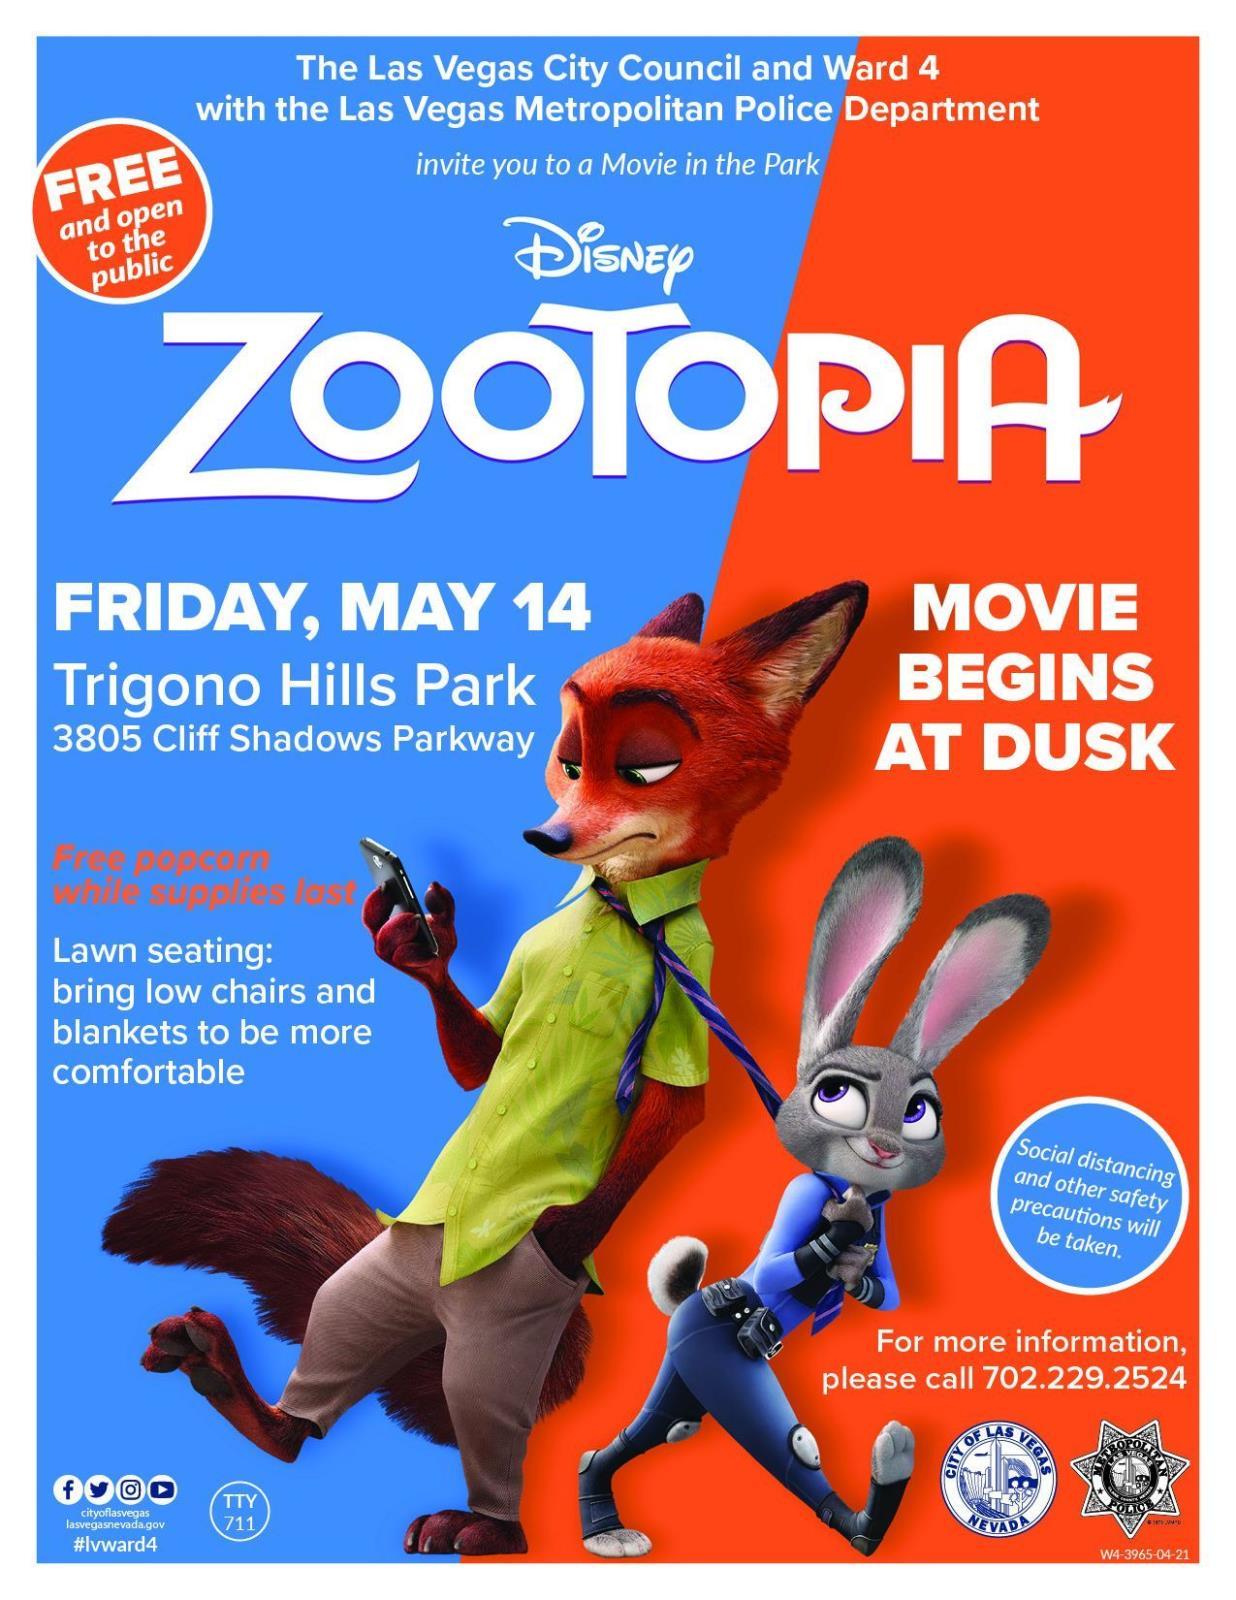 Ward-4_Zootopia-Movie-in-the-Park-May-14-2021.jpg